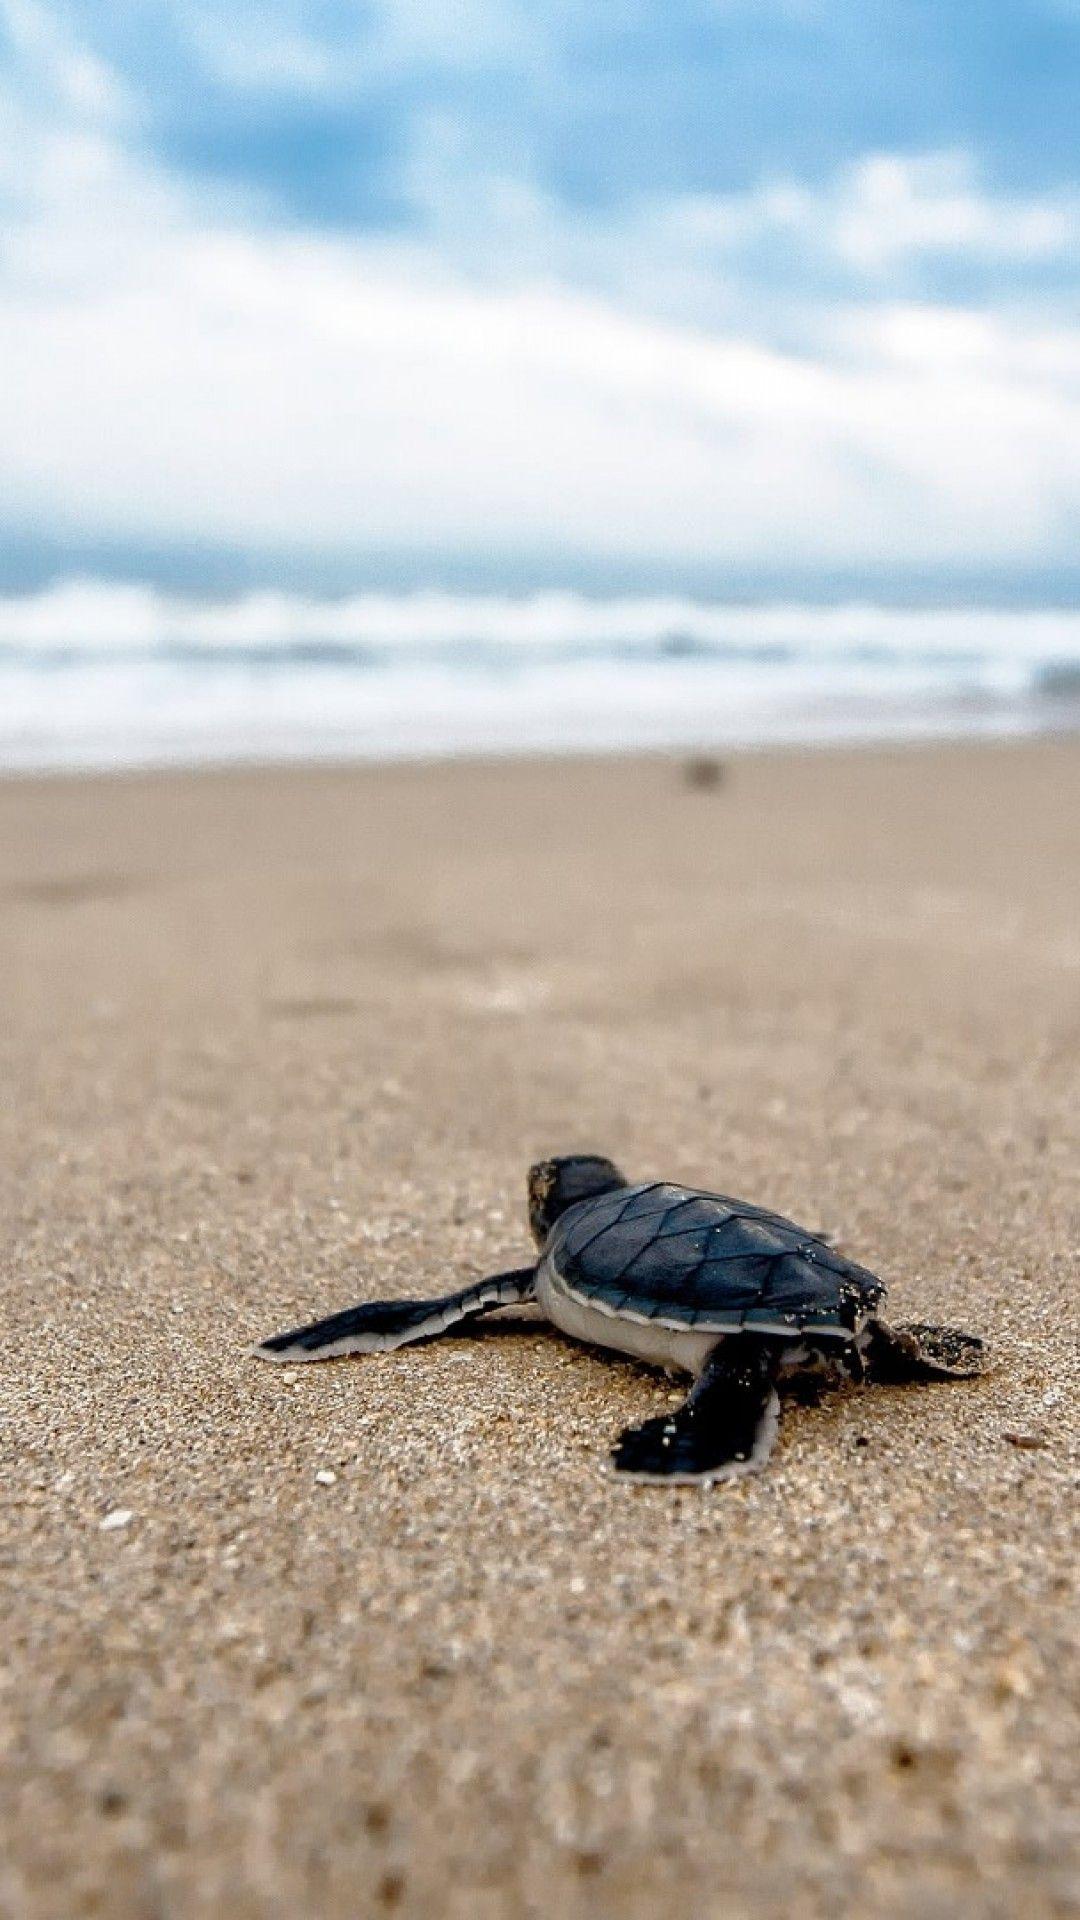 Turtle, Beach, Ocean, Clouds, Blurry, Waves, Sand Baby